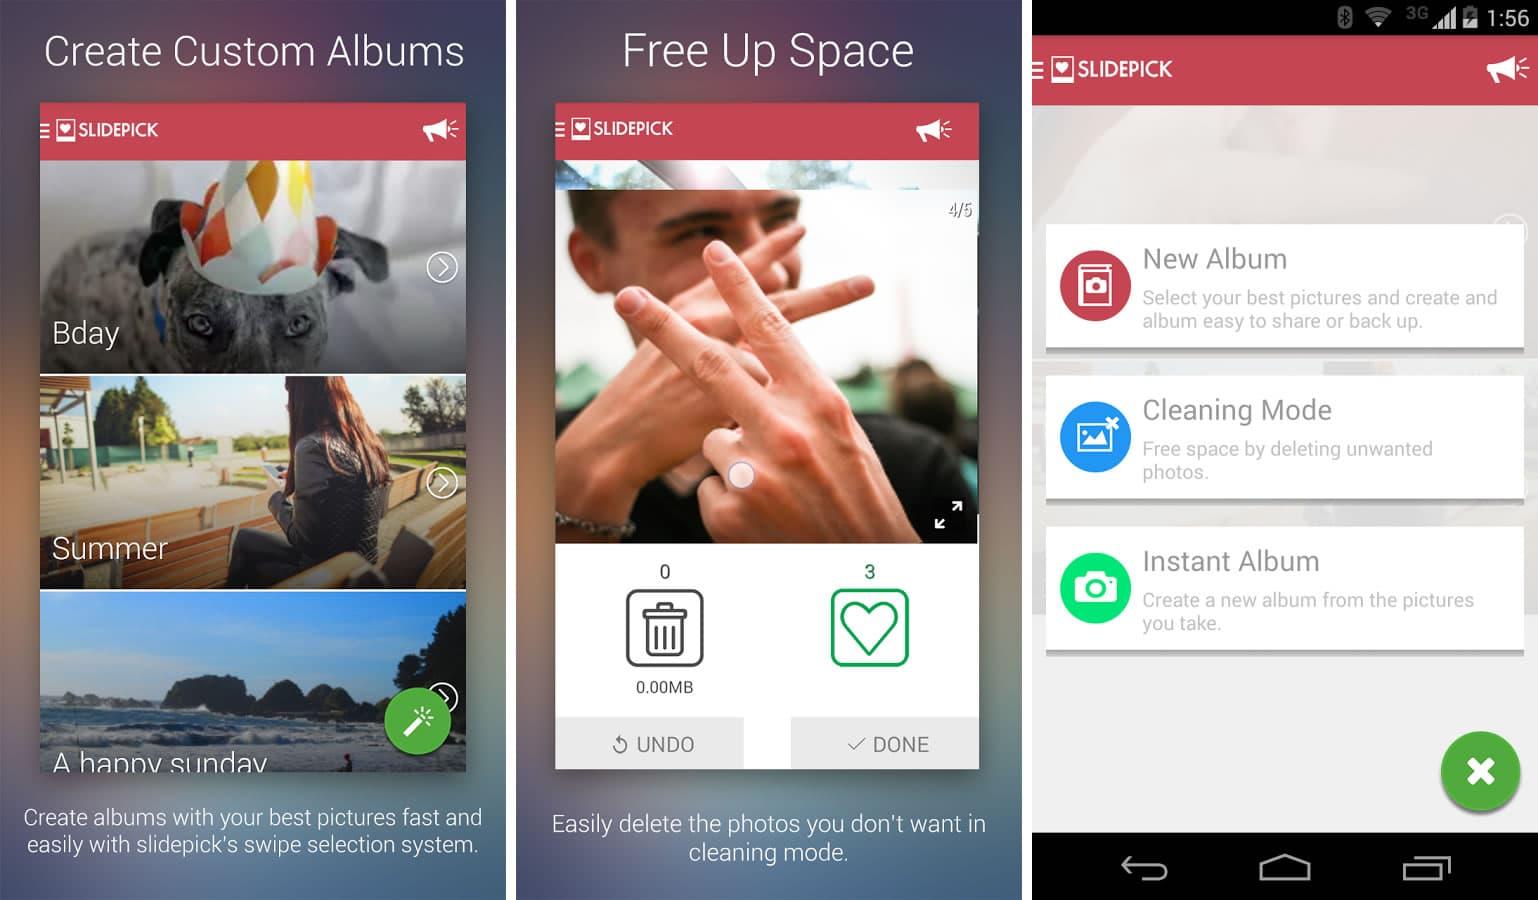 SlidePick está disponible para equipos con Android 4.0 o superior.